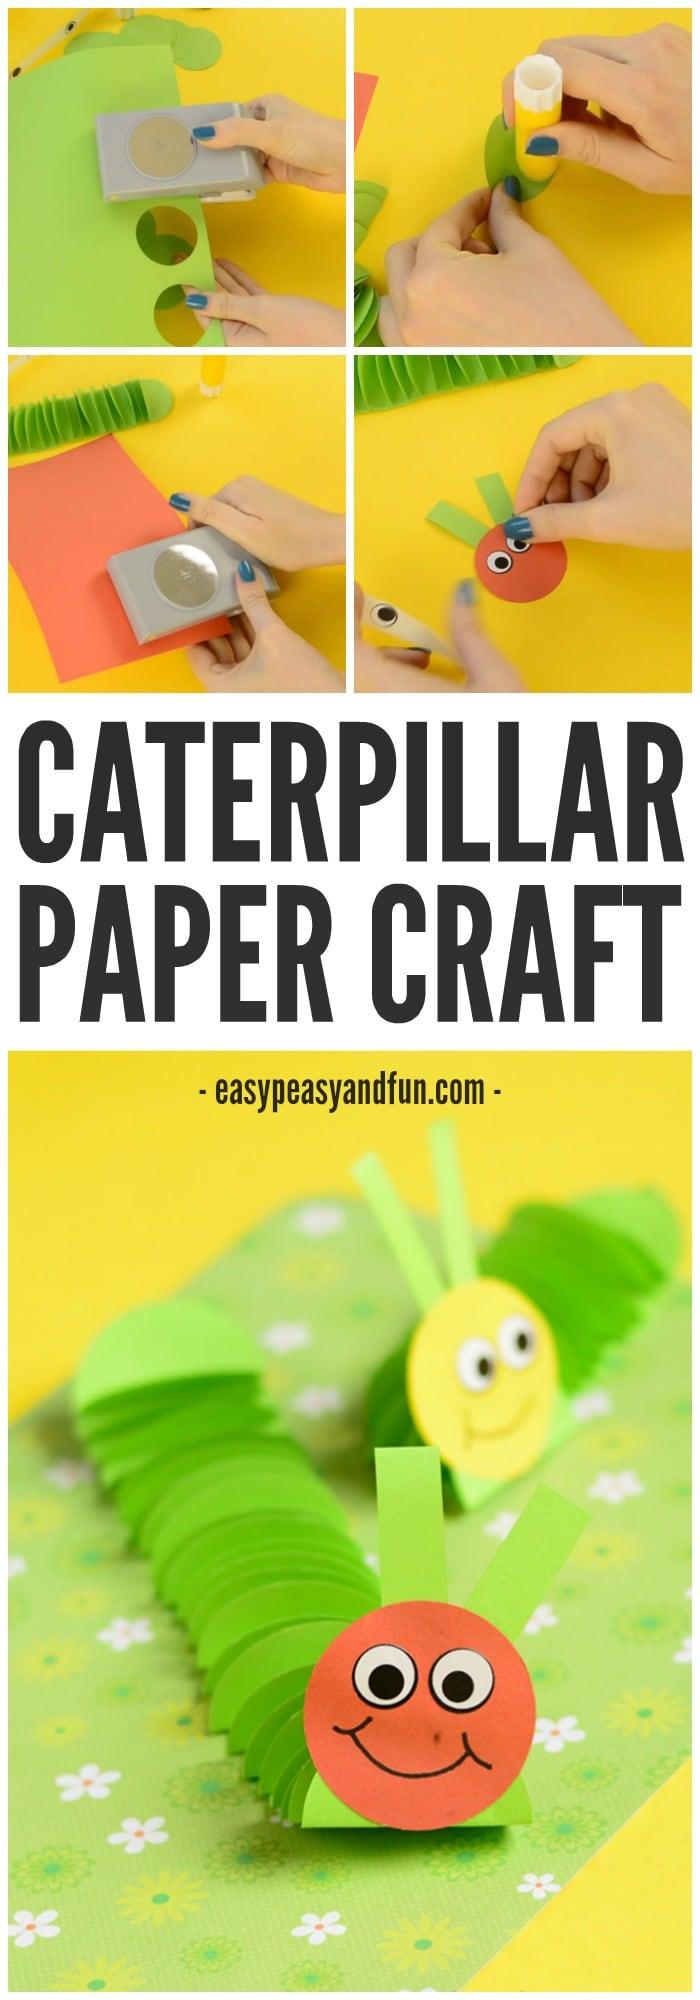 Adorable Caterpillar Paper Craft for Kids